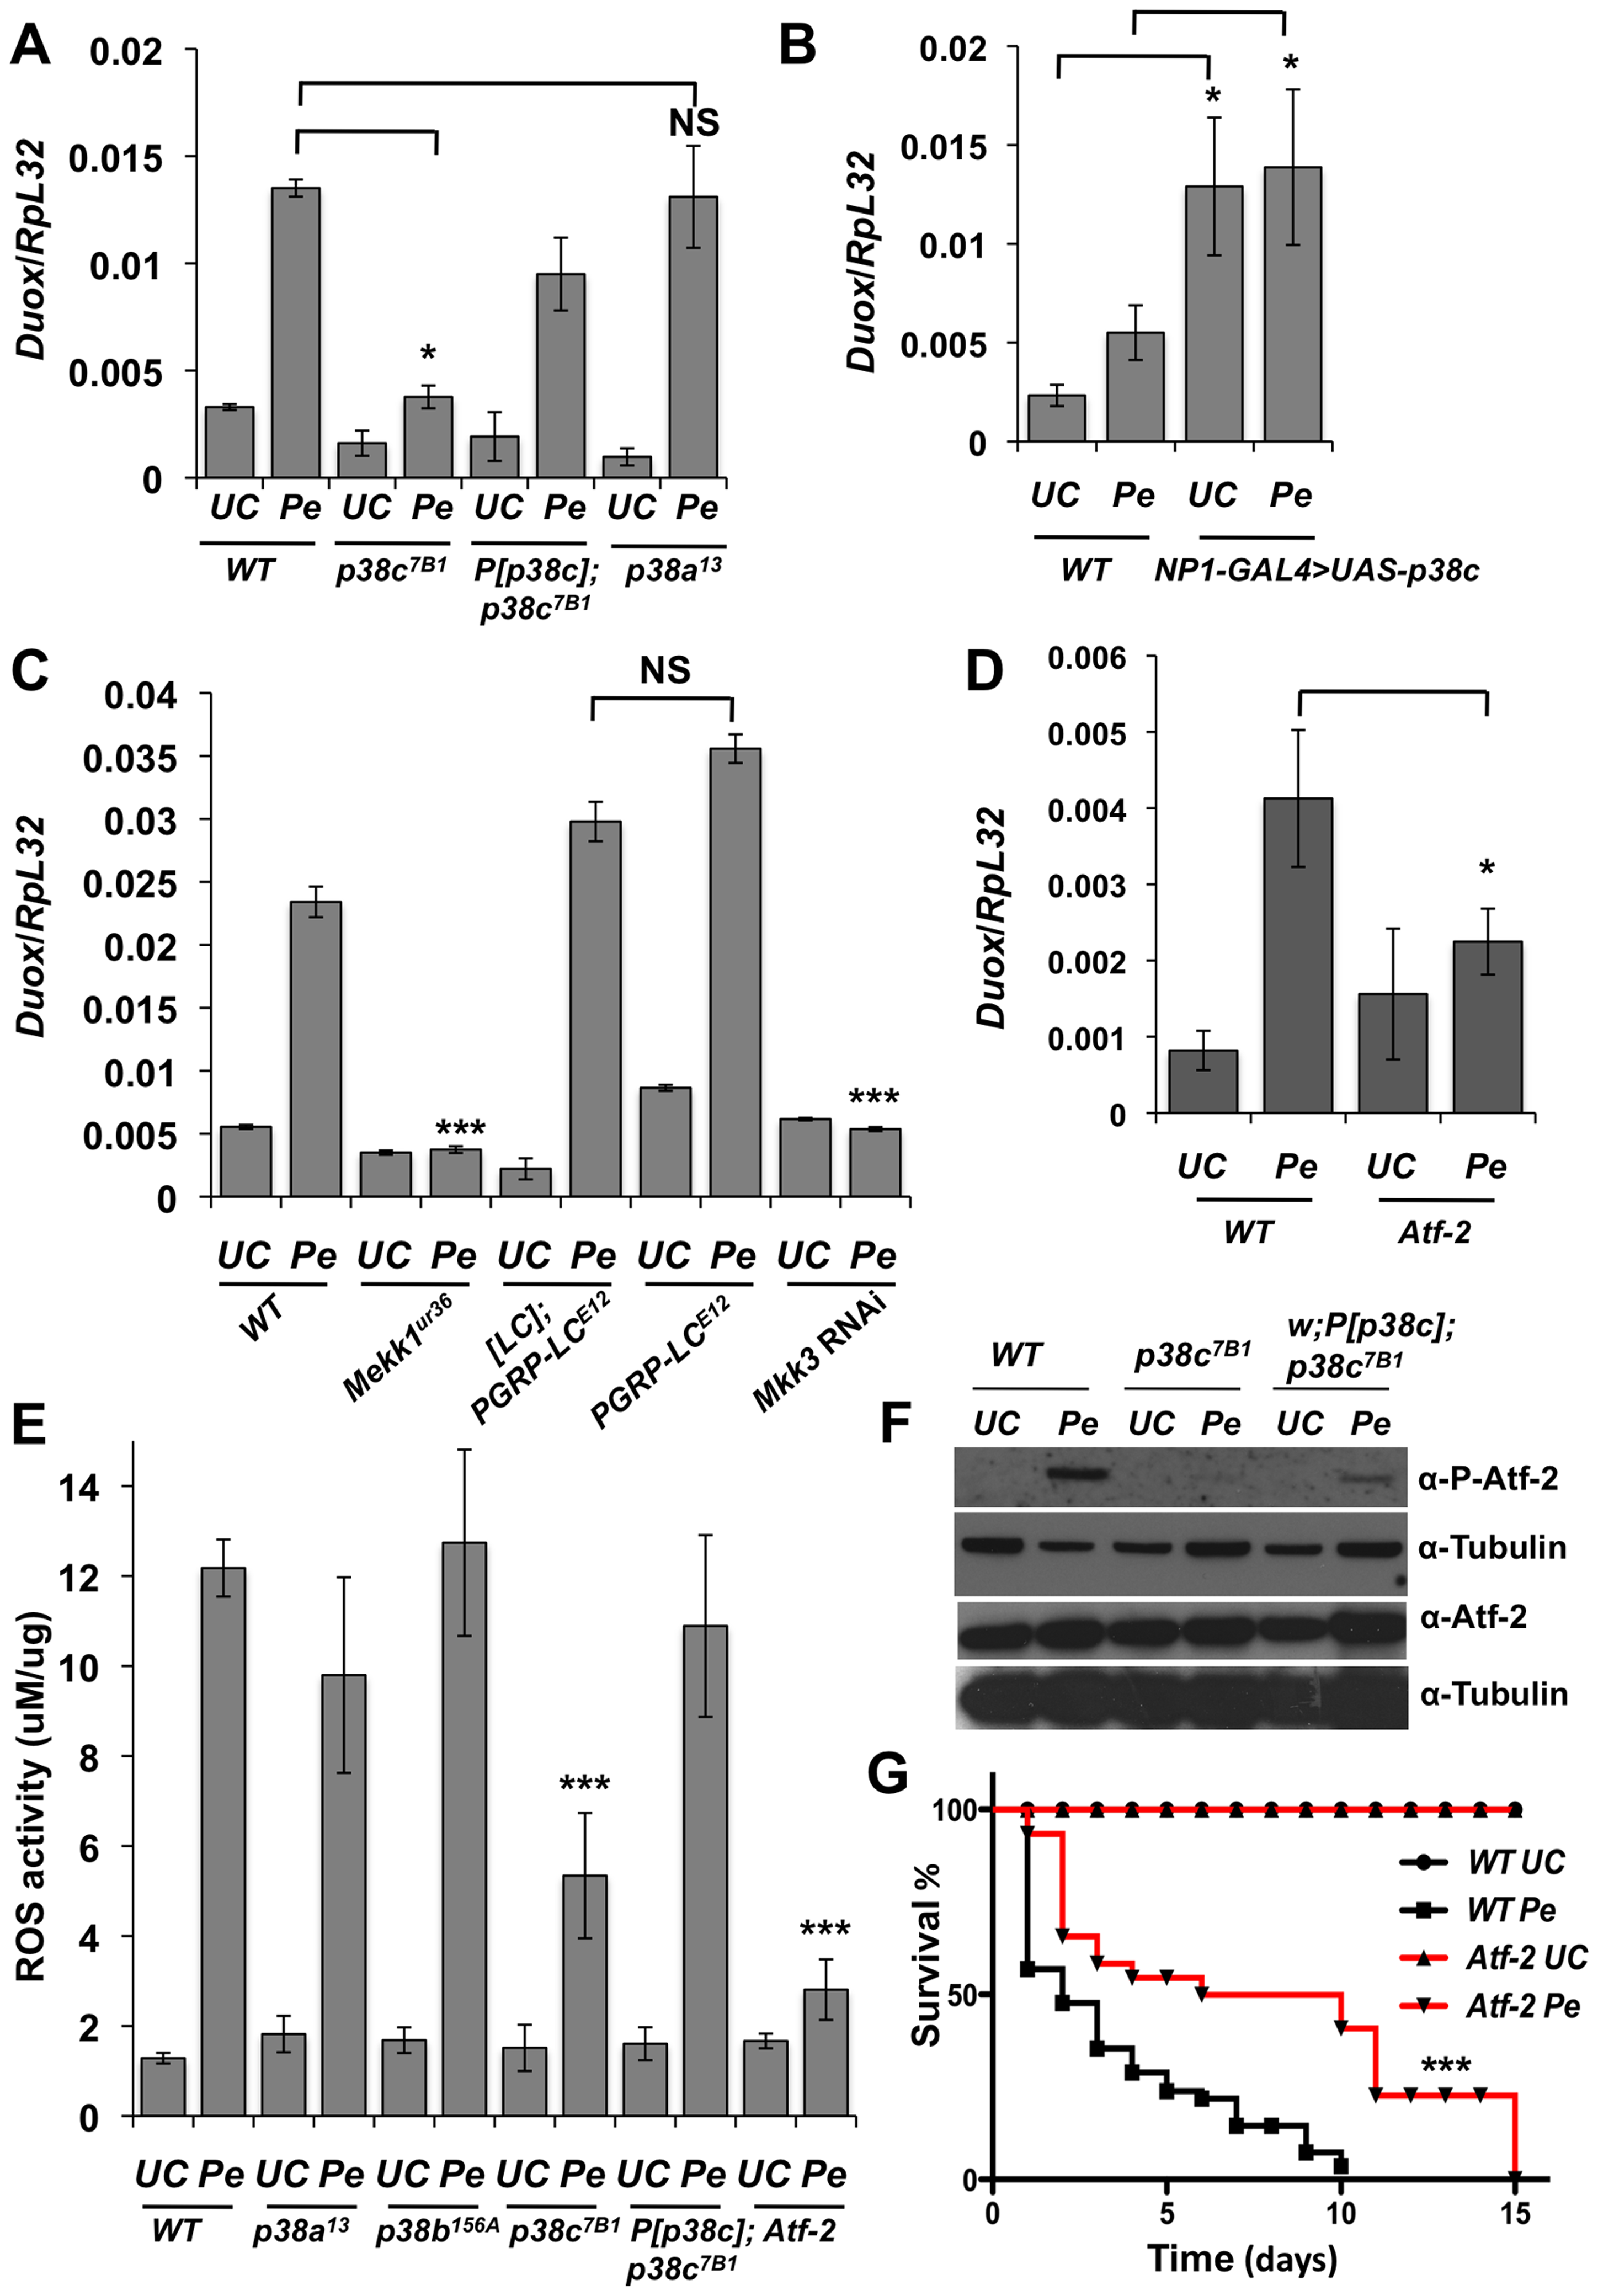 A Mekk1-Mkk3-P38c-Atf-2 pathway regulate <i>Duox</i> expression.